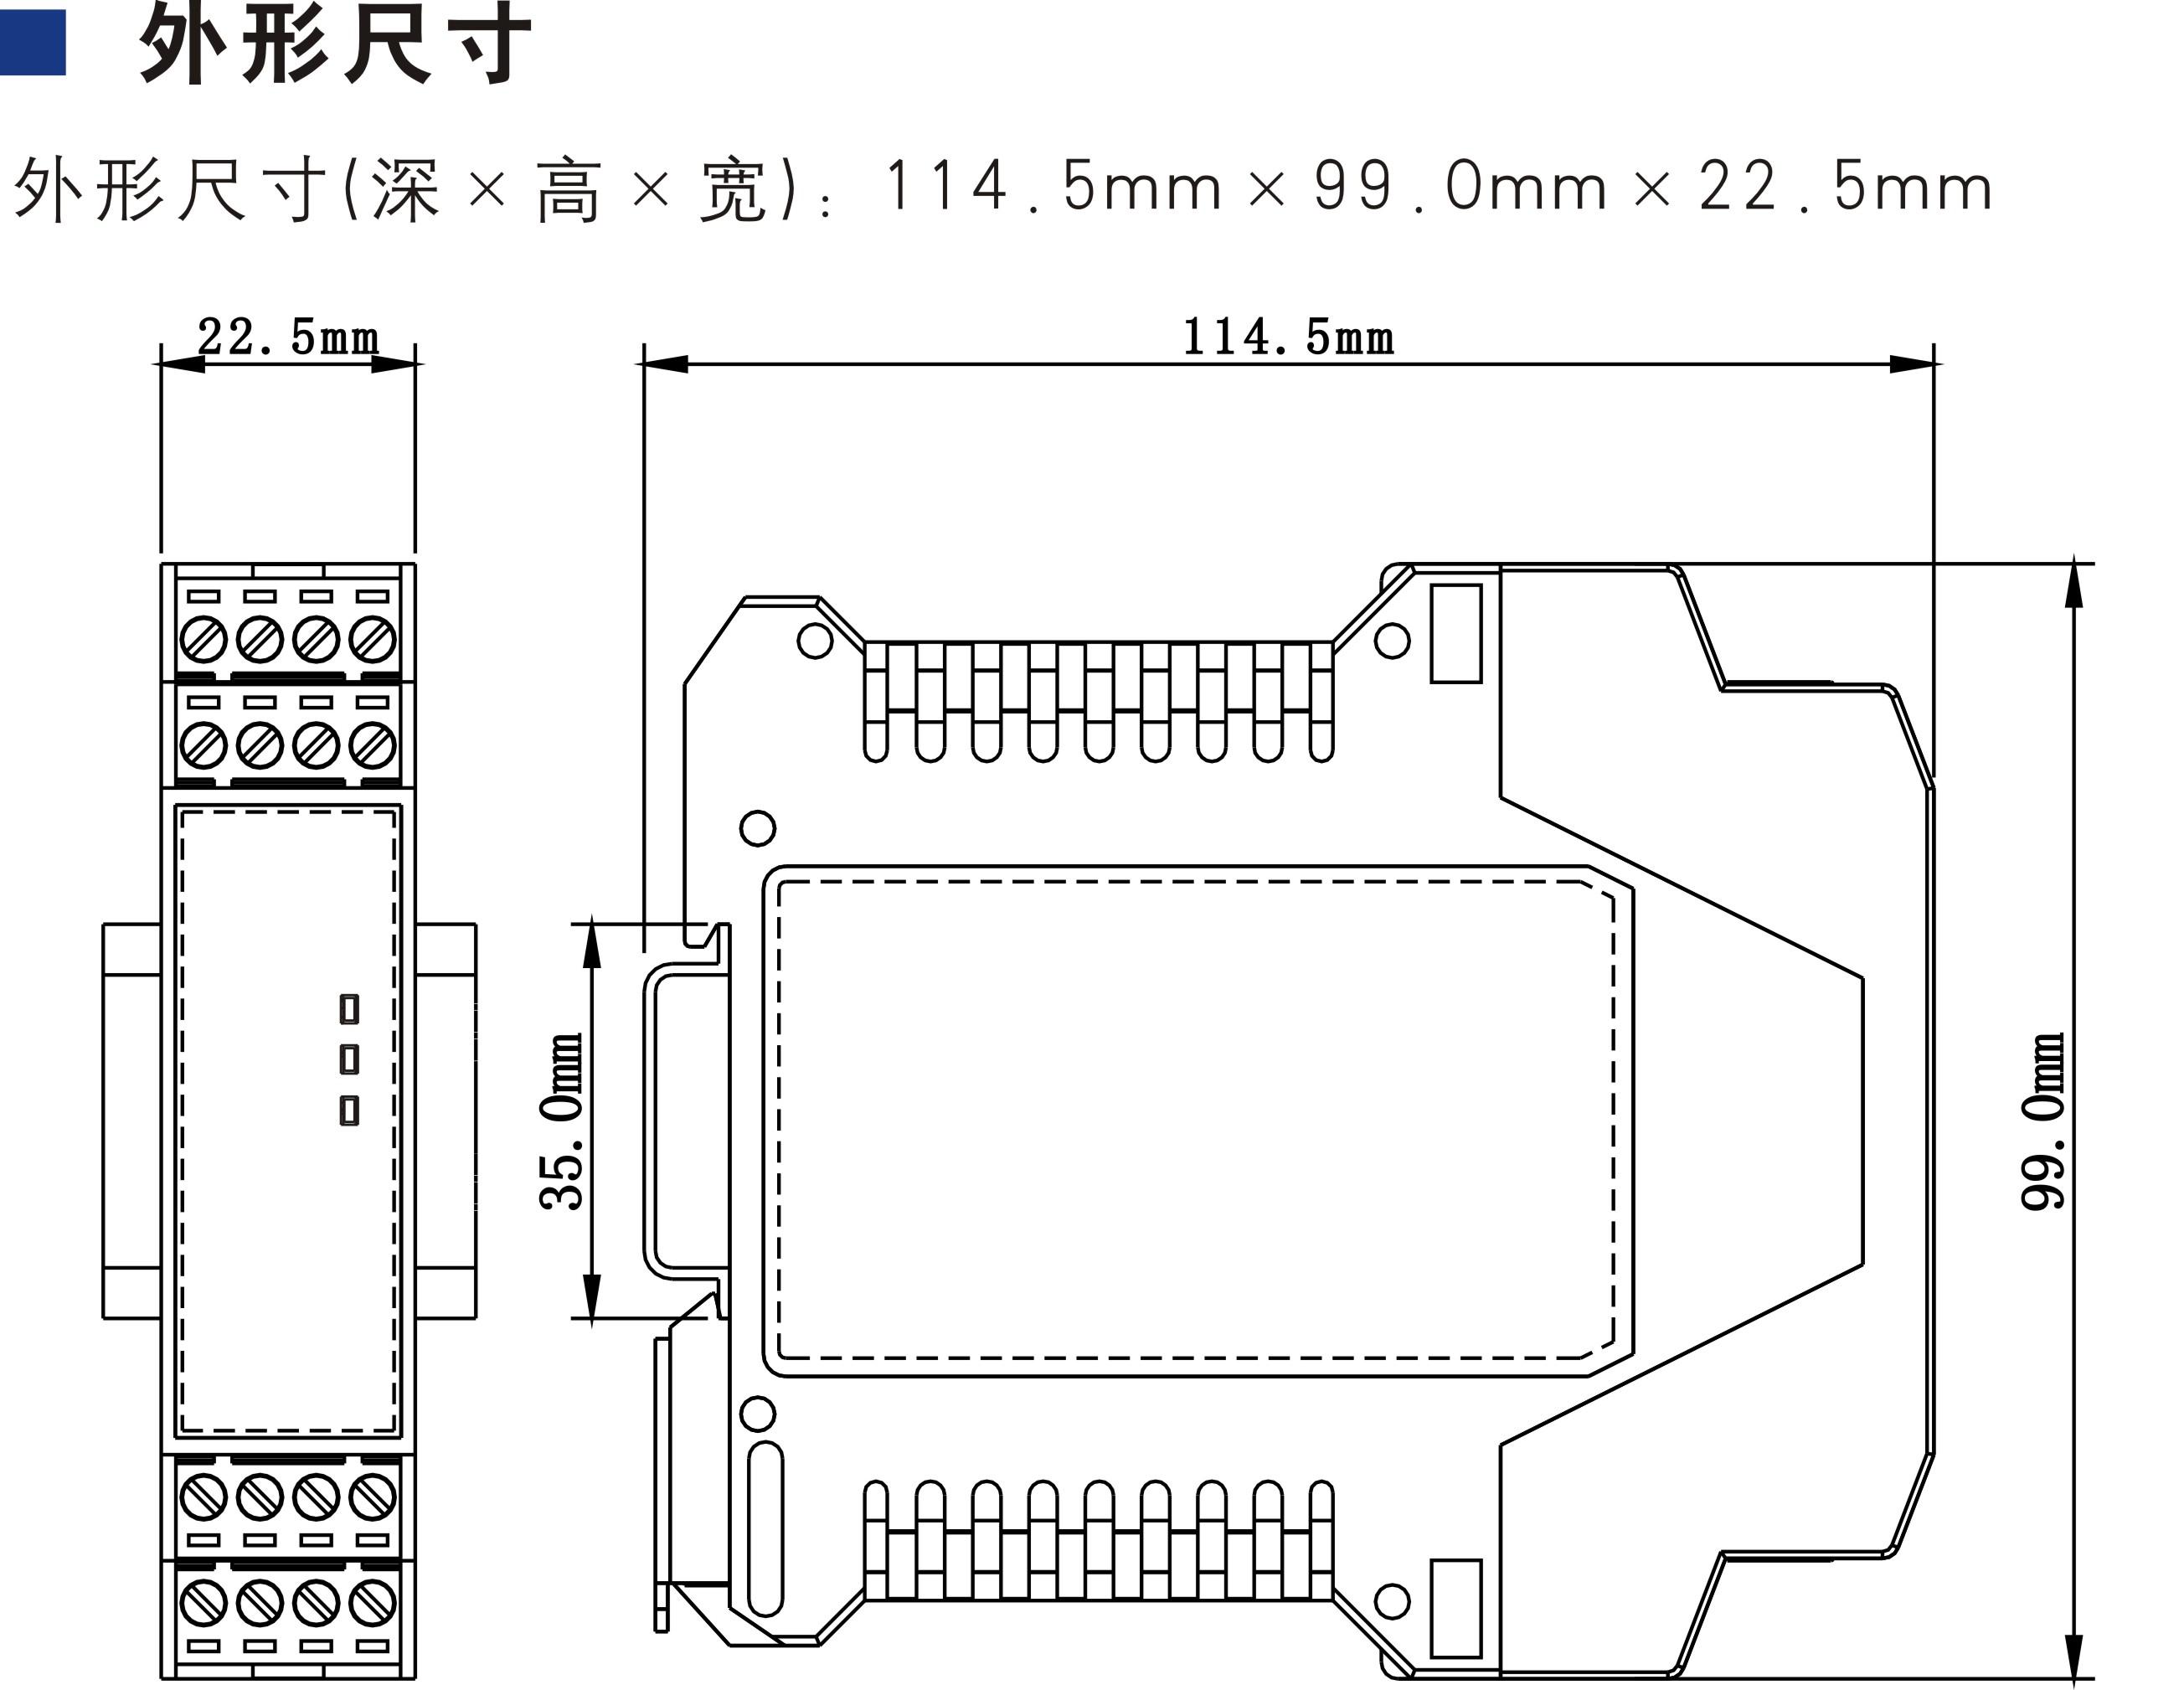 DO信号(SIS系统)输入 (DO信号(SIS系统) 24V DC 1NO 3A)